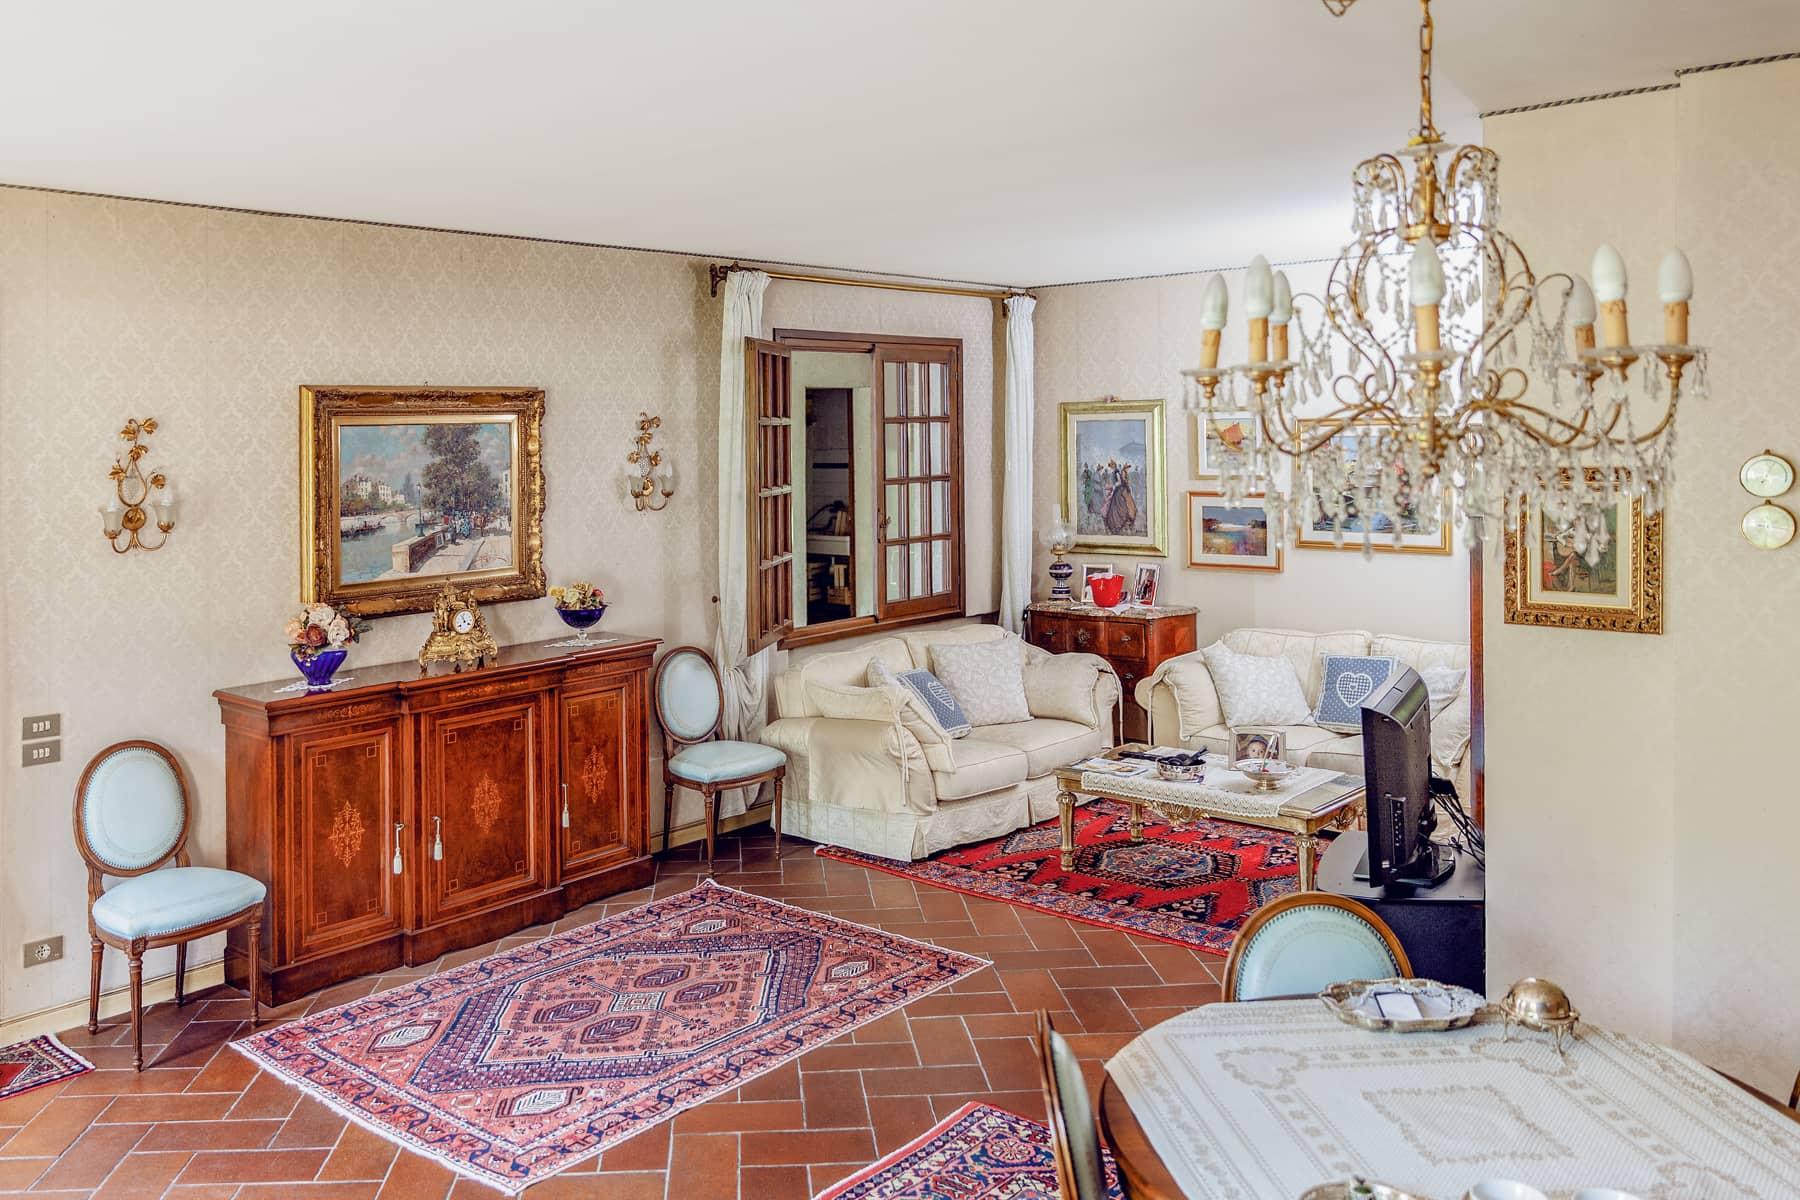 Villa in Vendita a Carbonera: 5 locali, 850 mq - Foto 10